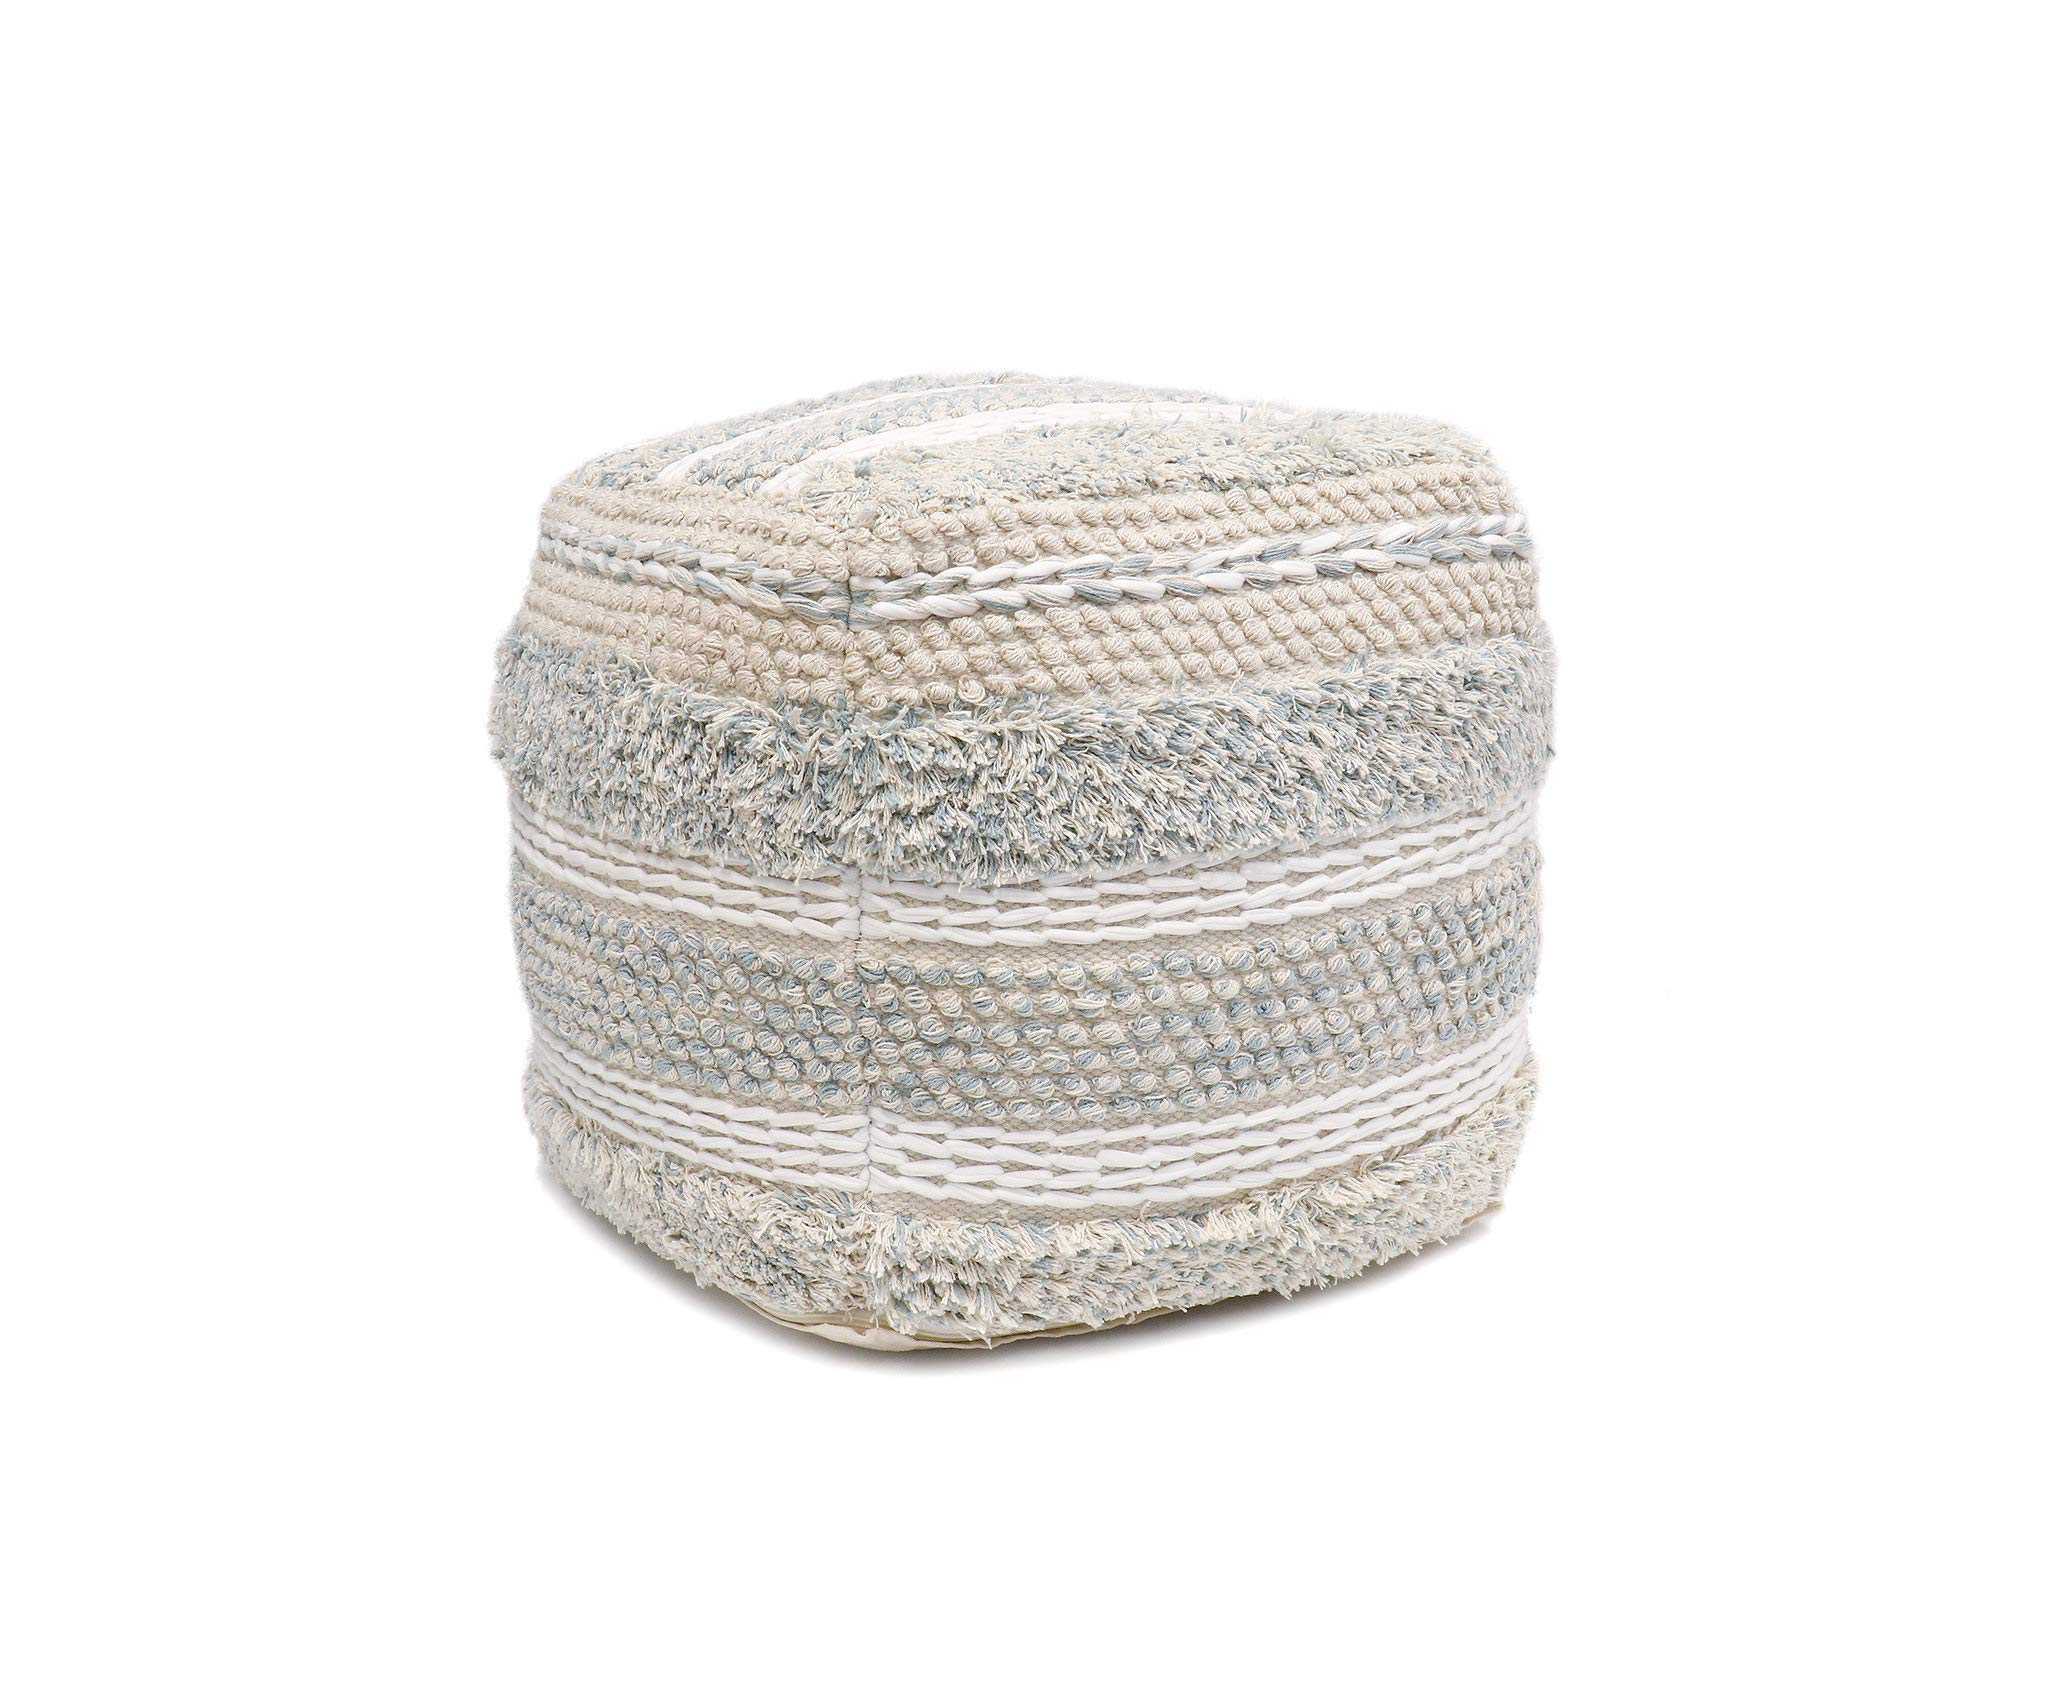 Pasargad Home Grandcanyon Collection Cotton Pouf, 17'' x 17'' x 17'', Beige by Pasargad Home